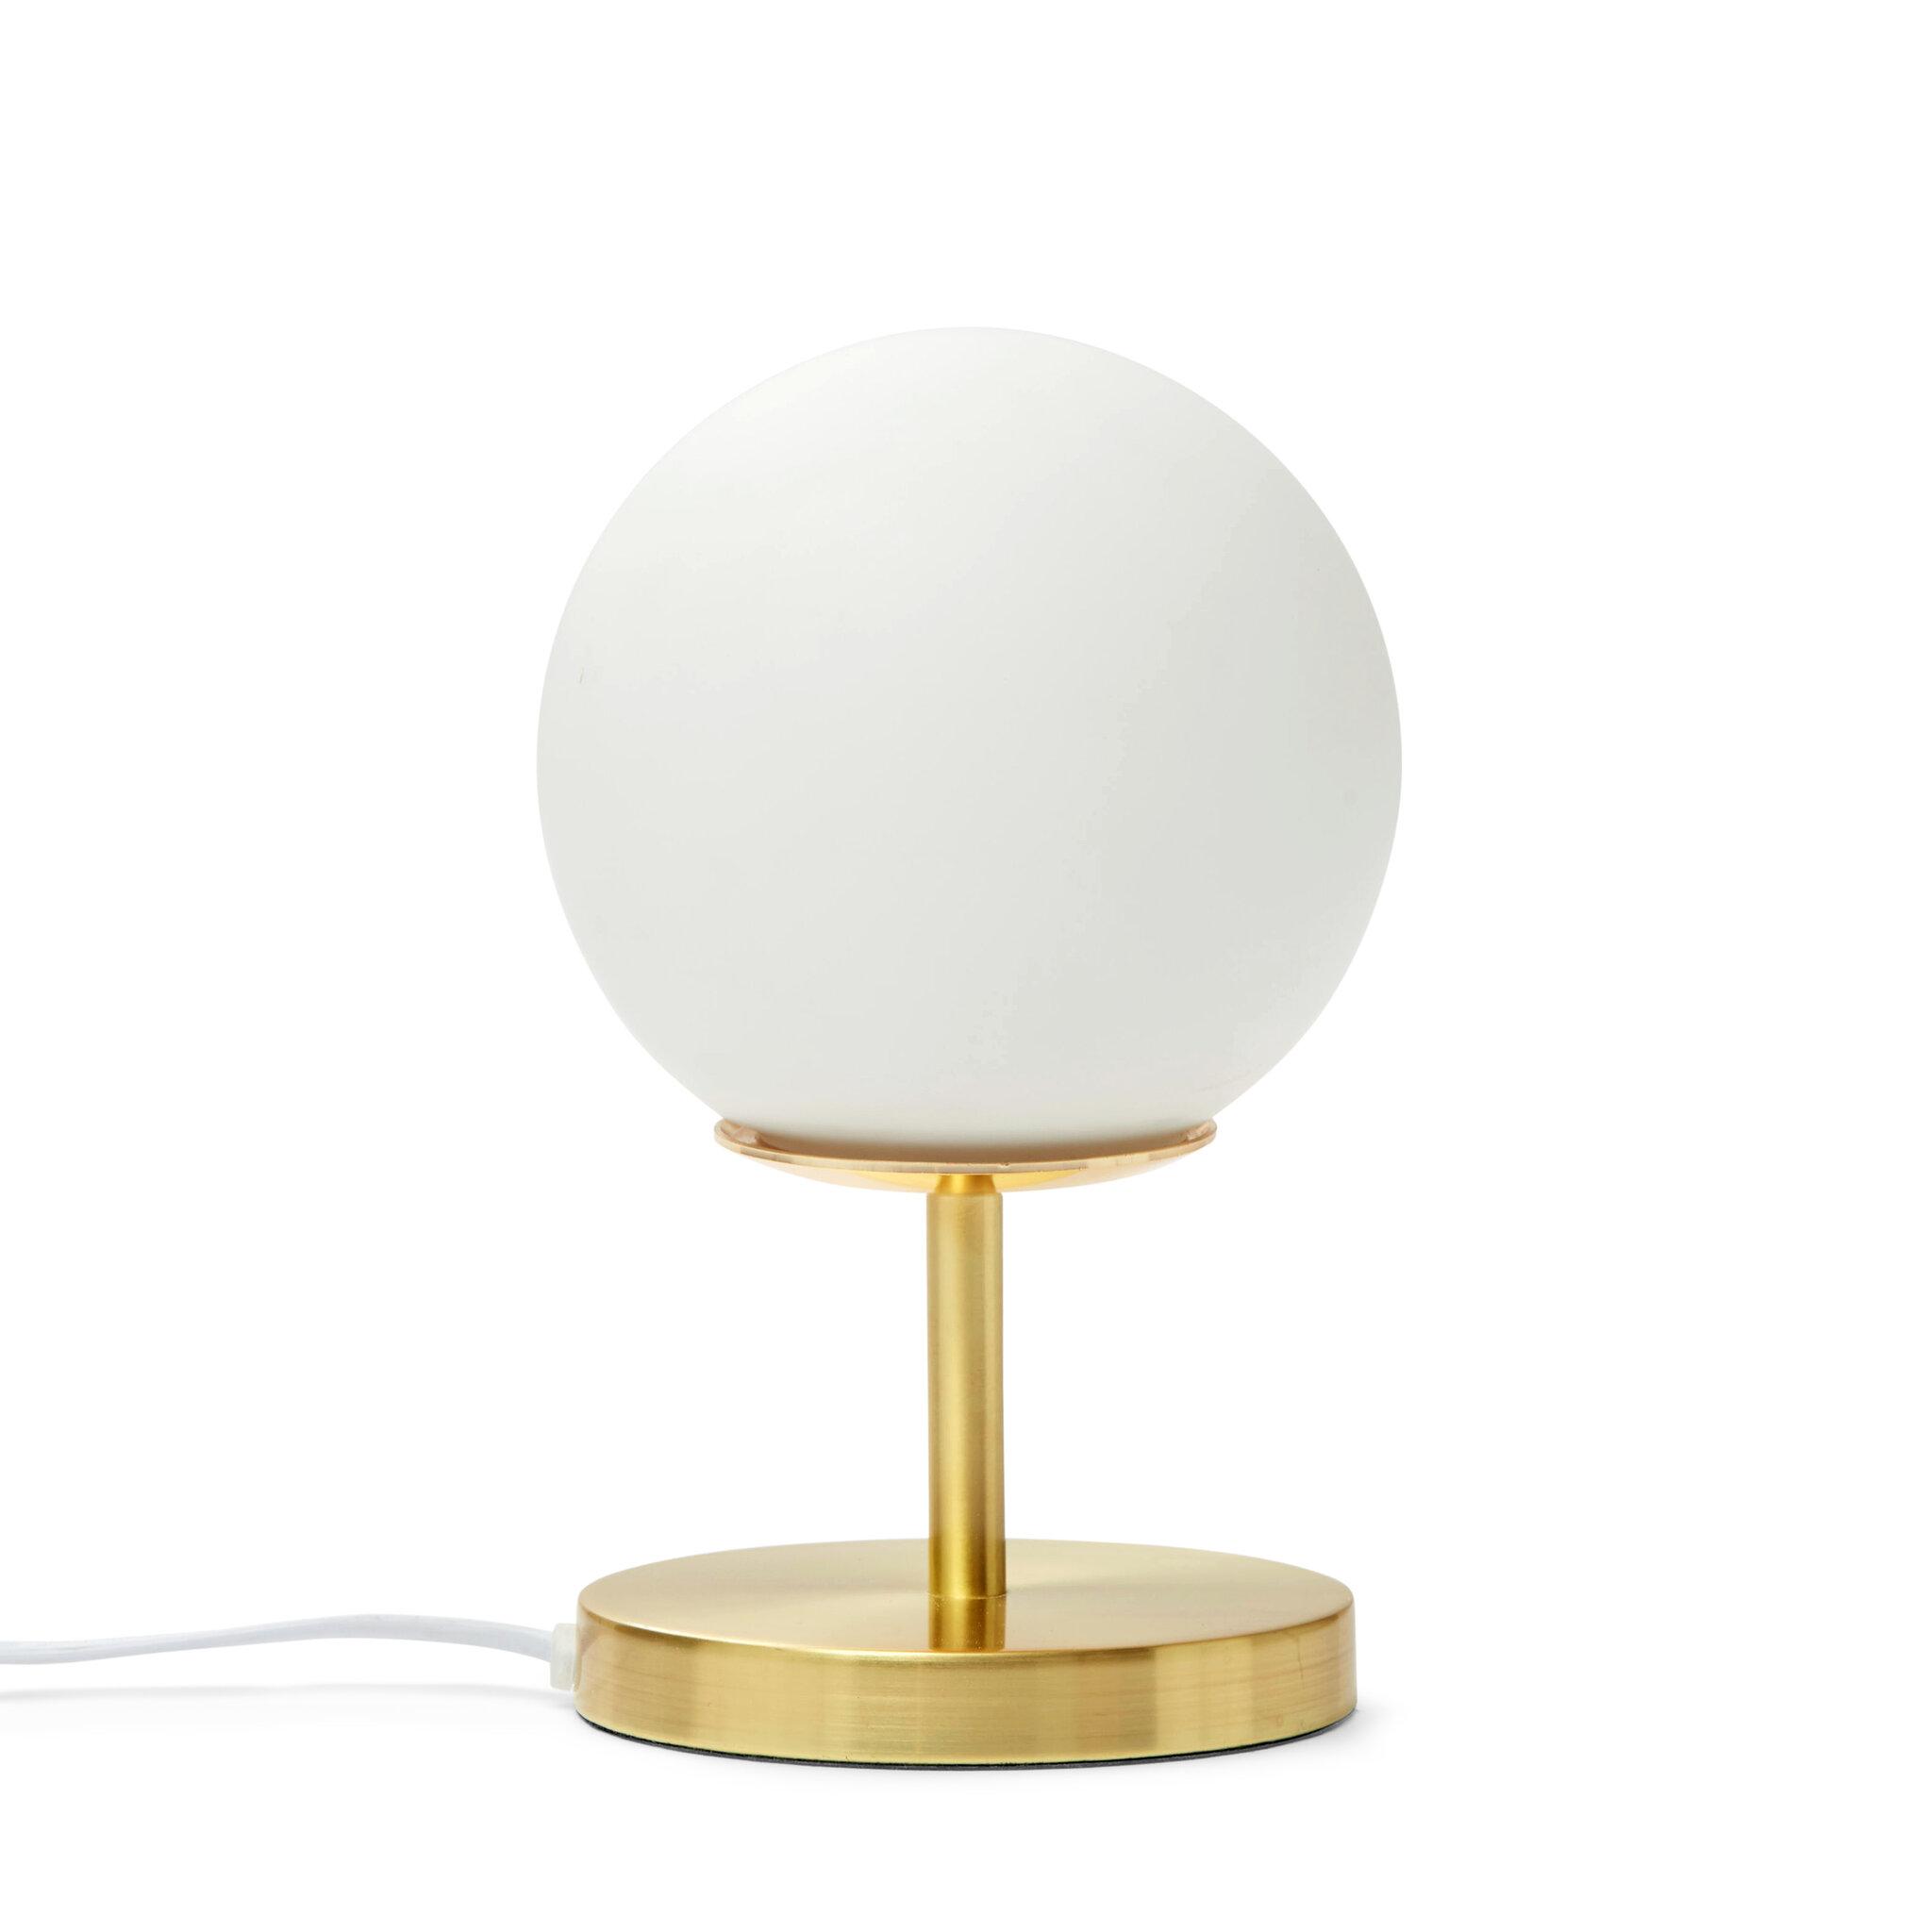 Bordslampa Rebecca, 23x15 cm